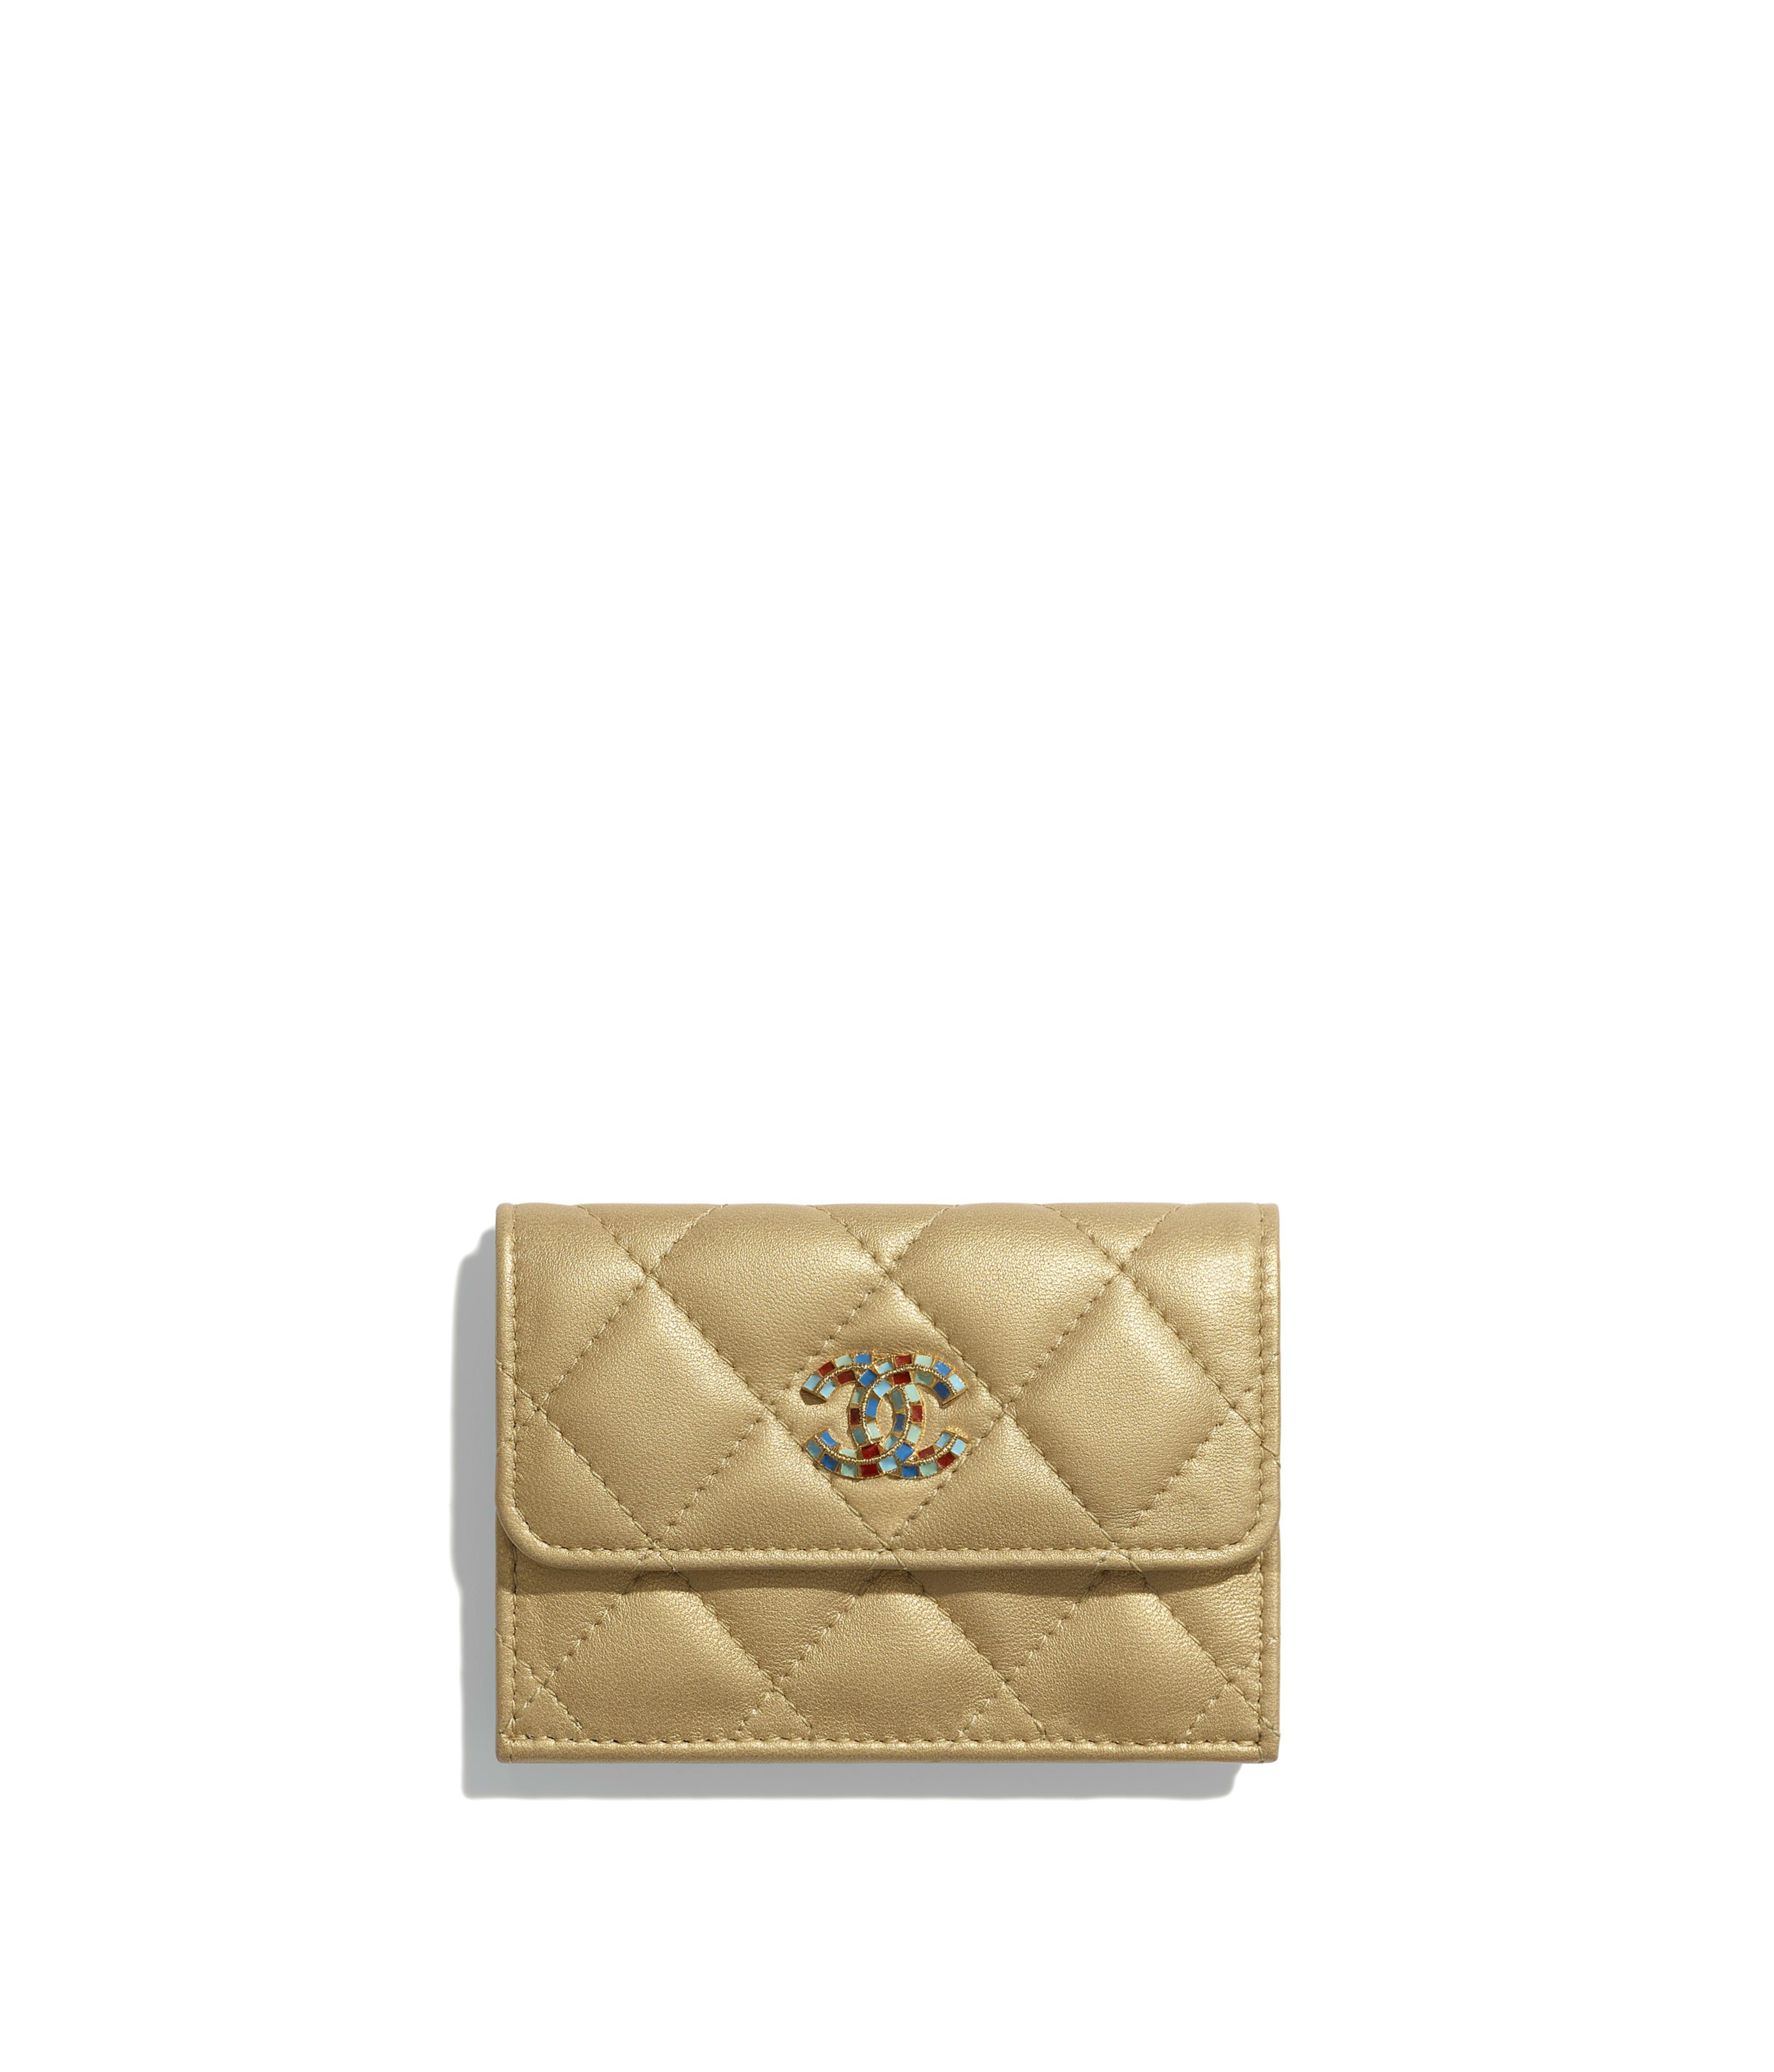 174deb703e55 Small Flap Wallet Metallic Lambskin & Gold-Tone Metal, Gold Ref.  AP0524B00868N4734